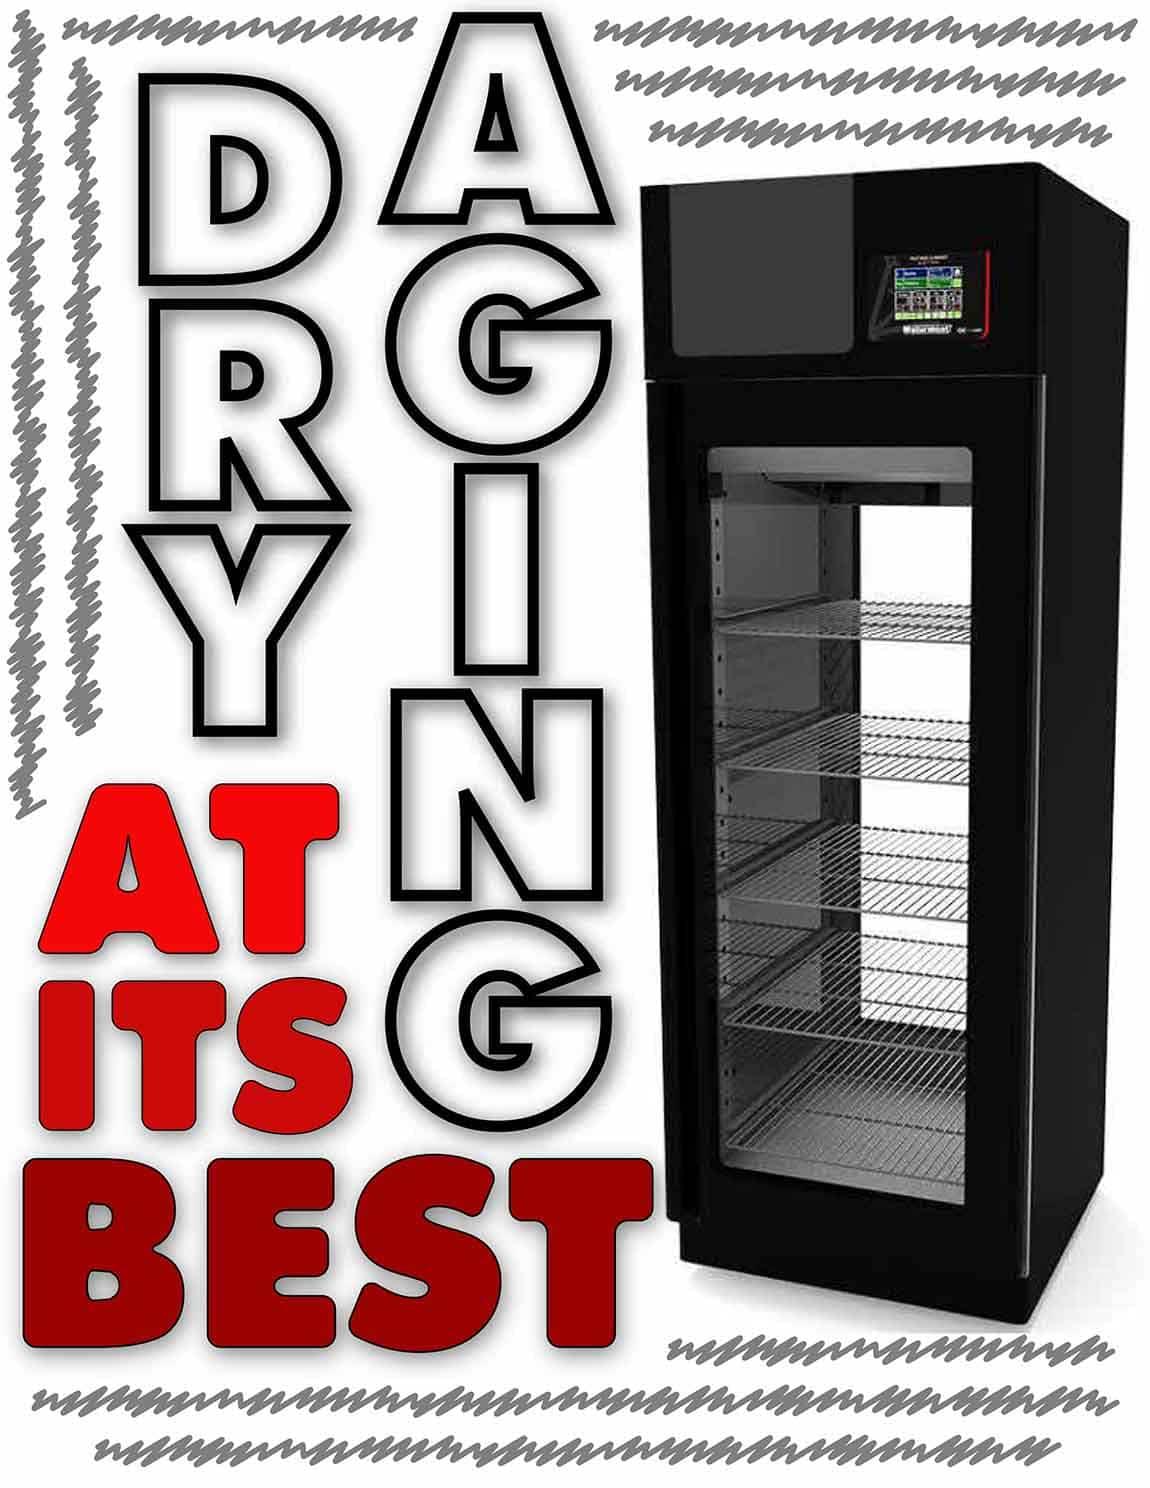 "<img src=""Maturmeat-100-kg-TV.jpg"" alt=""dry ager fridge with text"">"